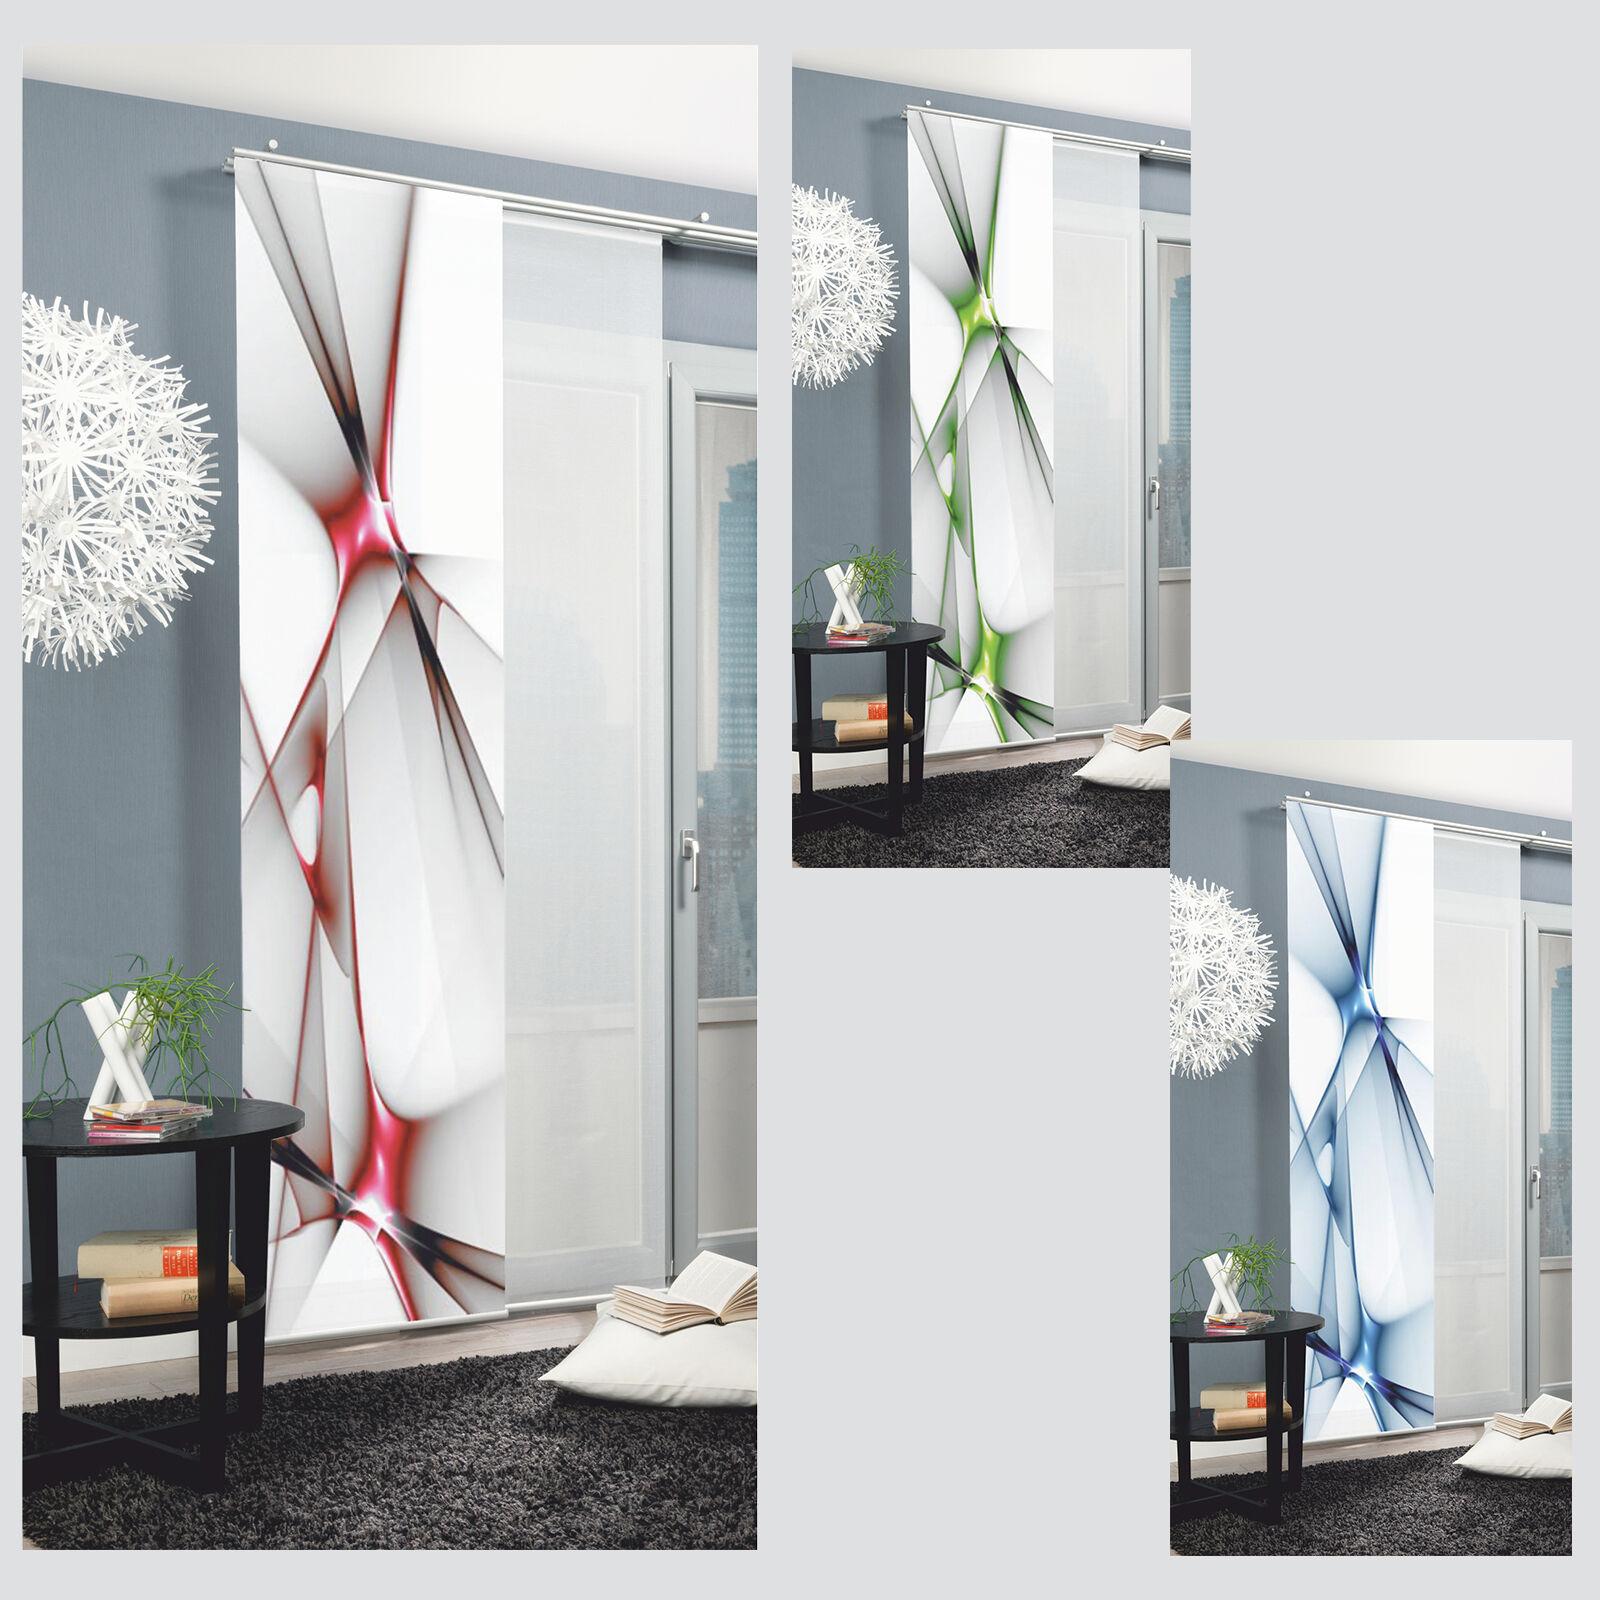 Franklin Schiebevorhang Schiebegardine Raumteiler Digital Home Wohnideen  Schmidt   EBay